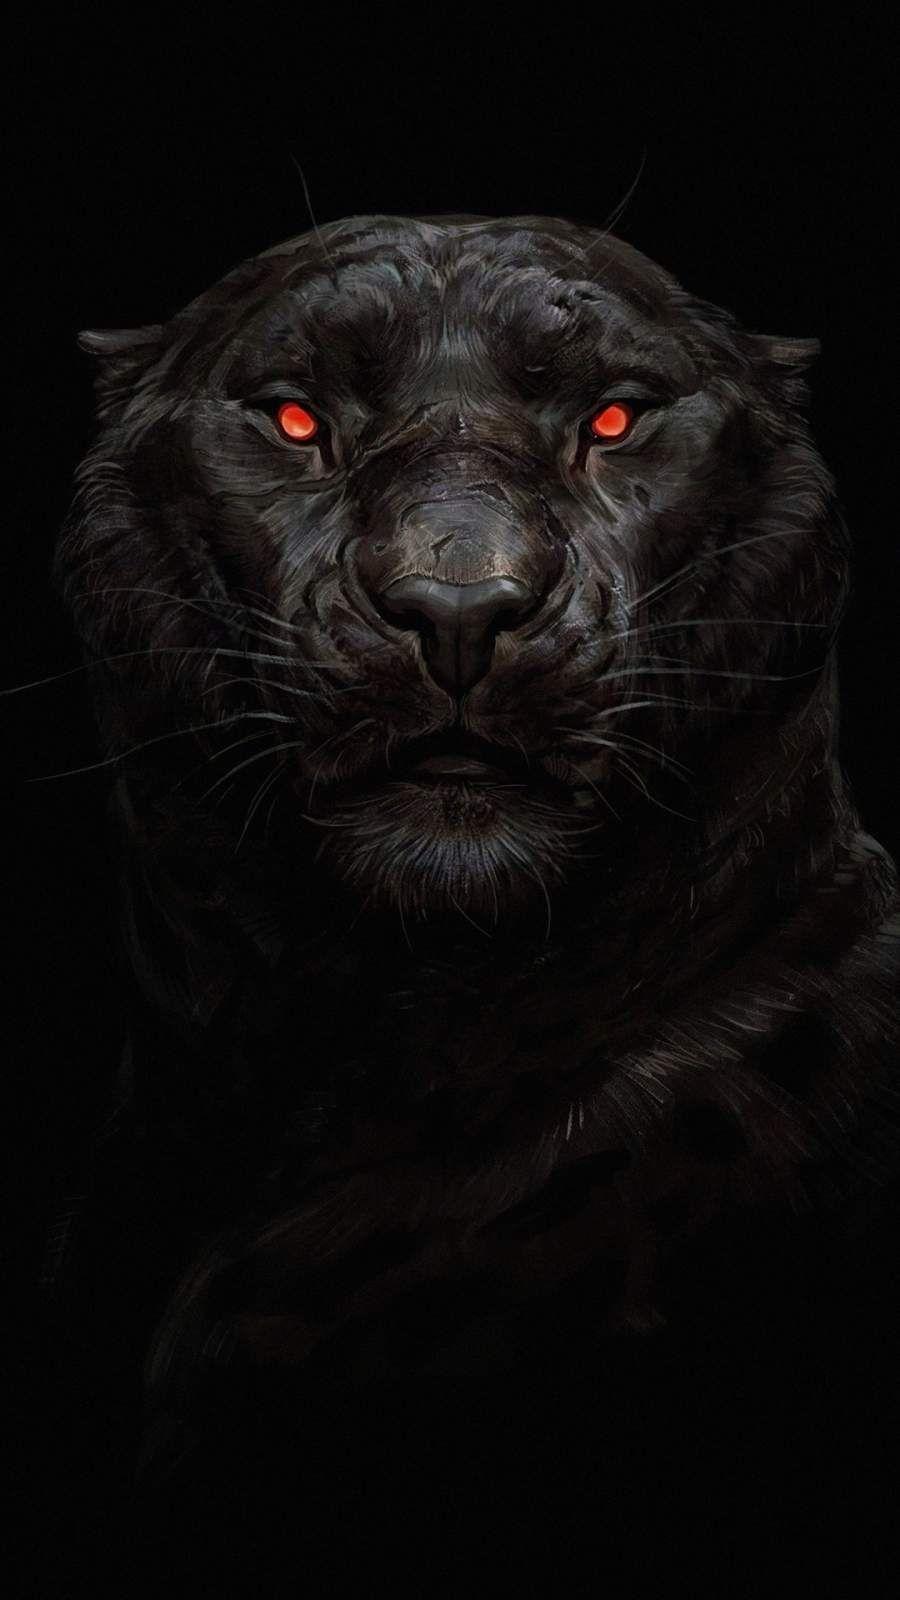 Pin By Bugis Shop On My Me Wallpapers In 2020 Jaguar Animal Black Panther Hd Wallpaper Dark Wallpaper